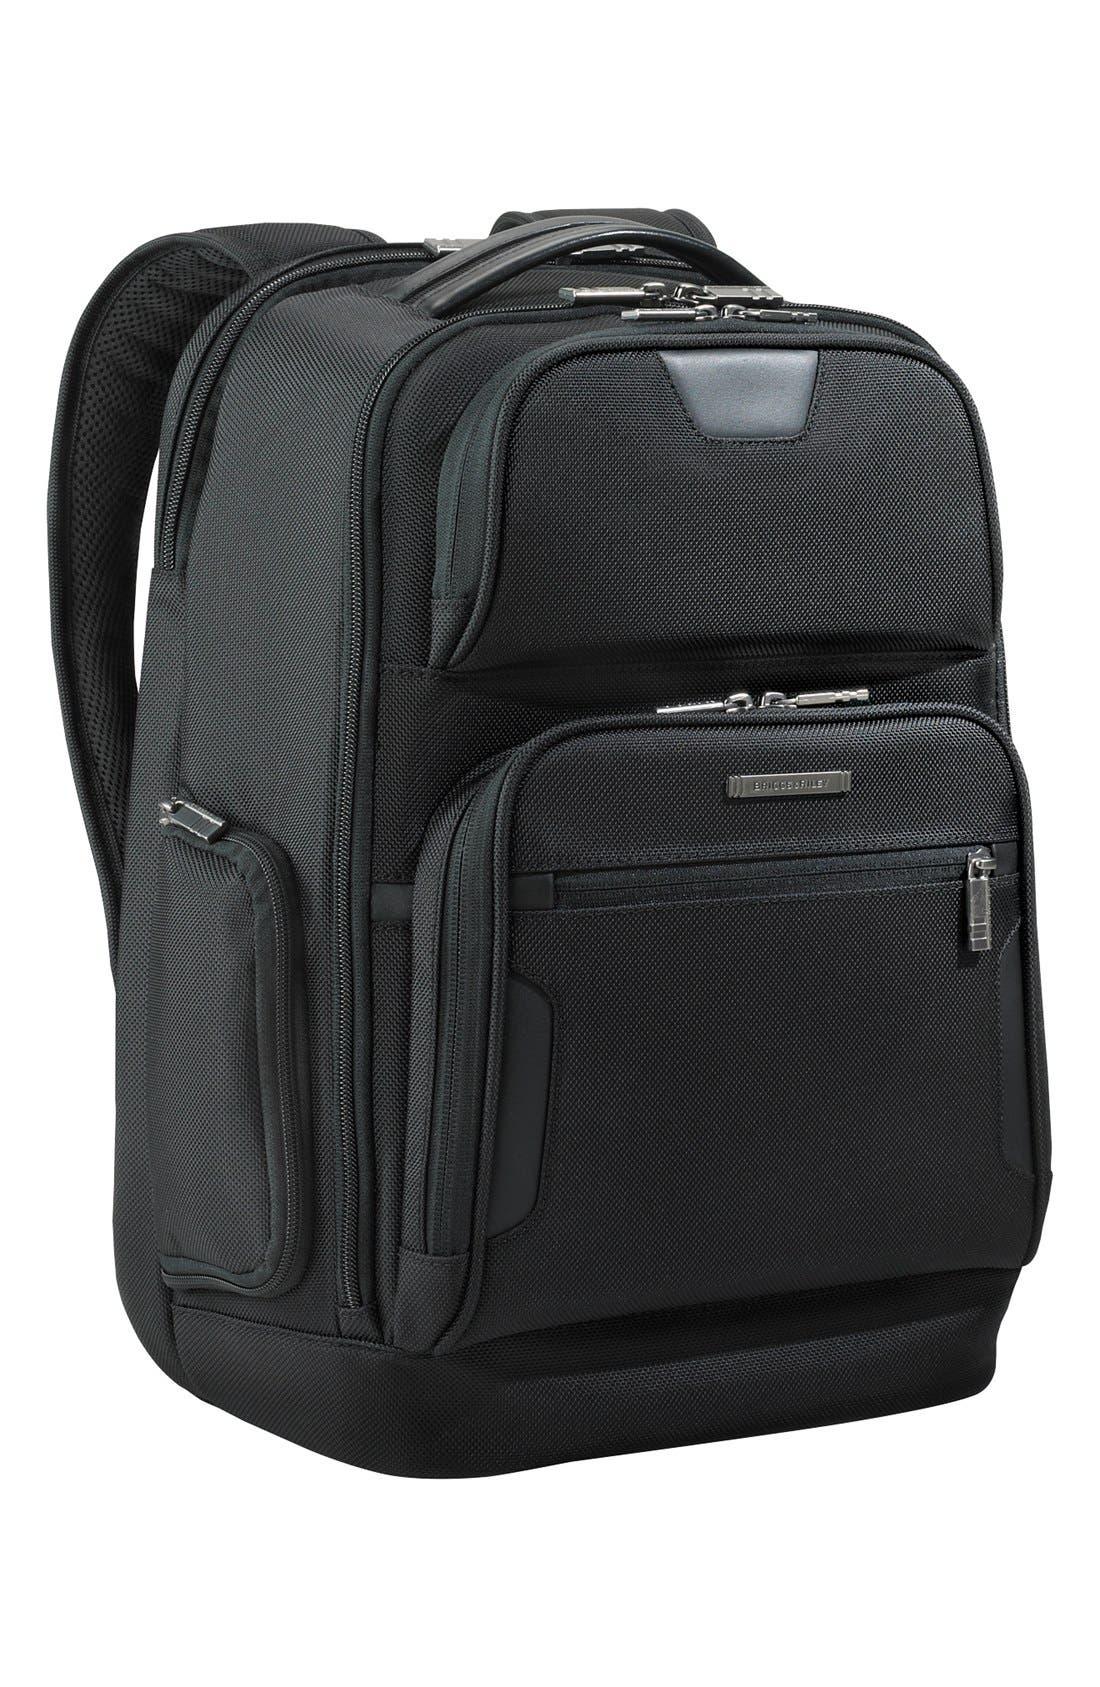 Briggs & Riley 'Medium' Ballistic Nylon Backpack